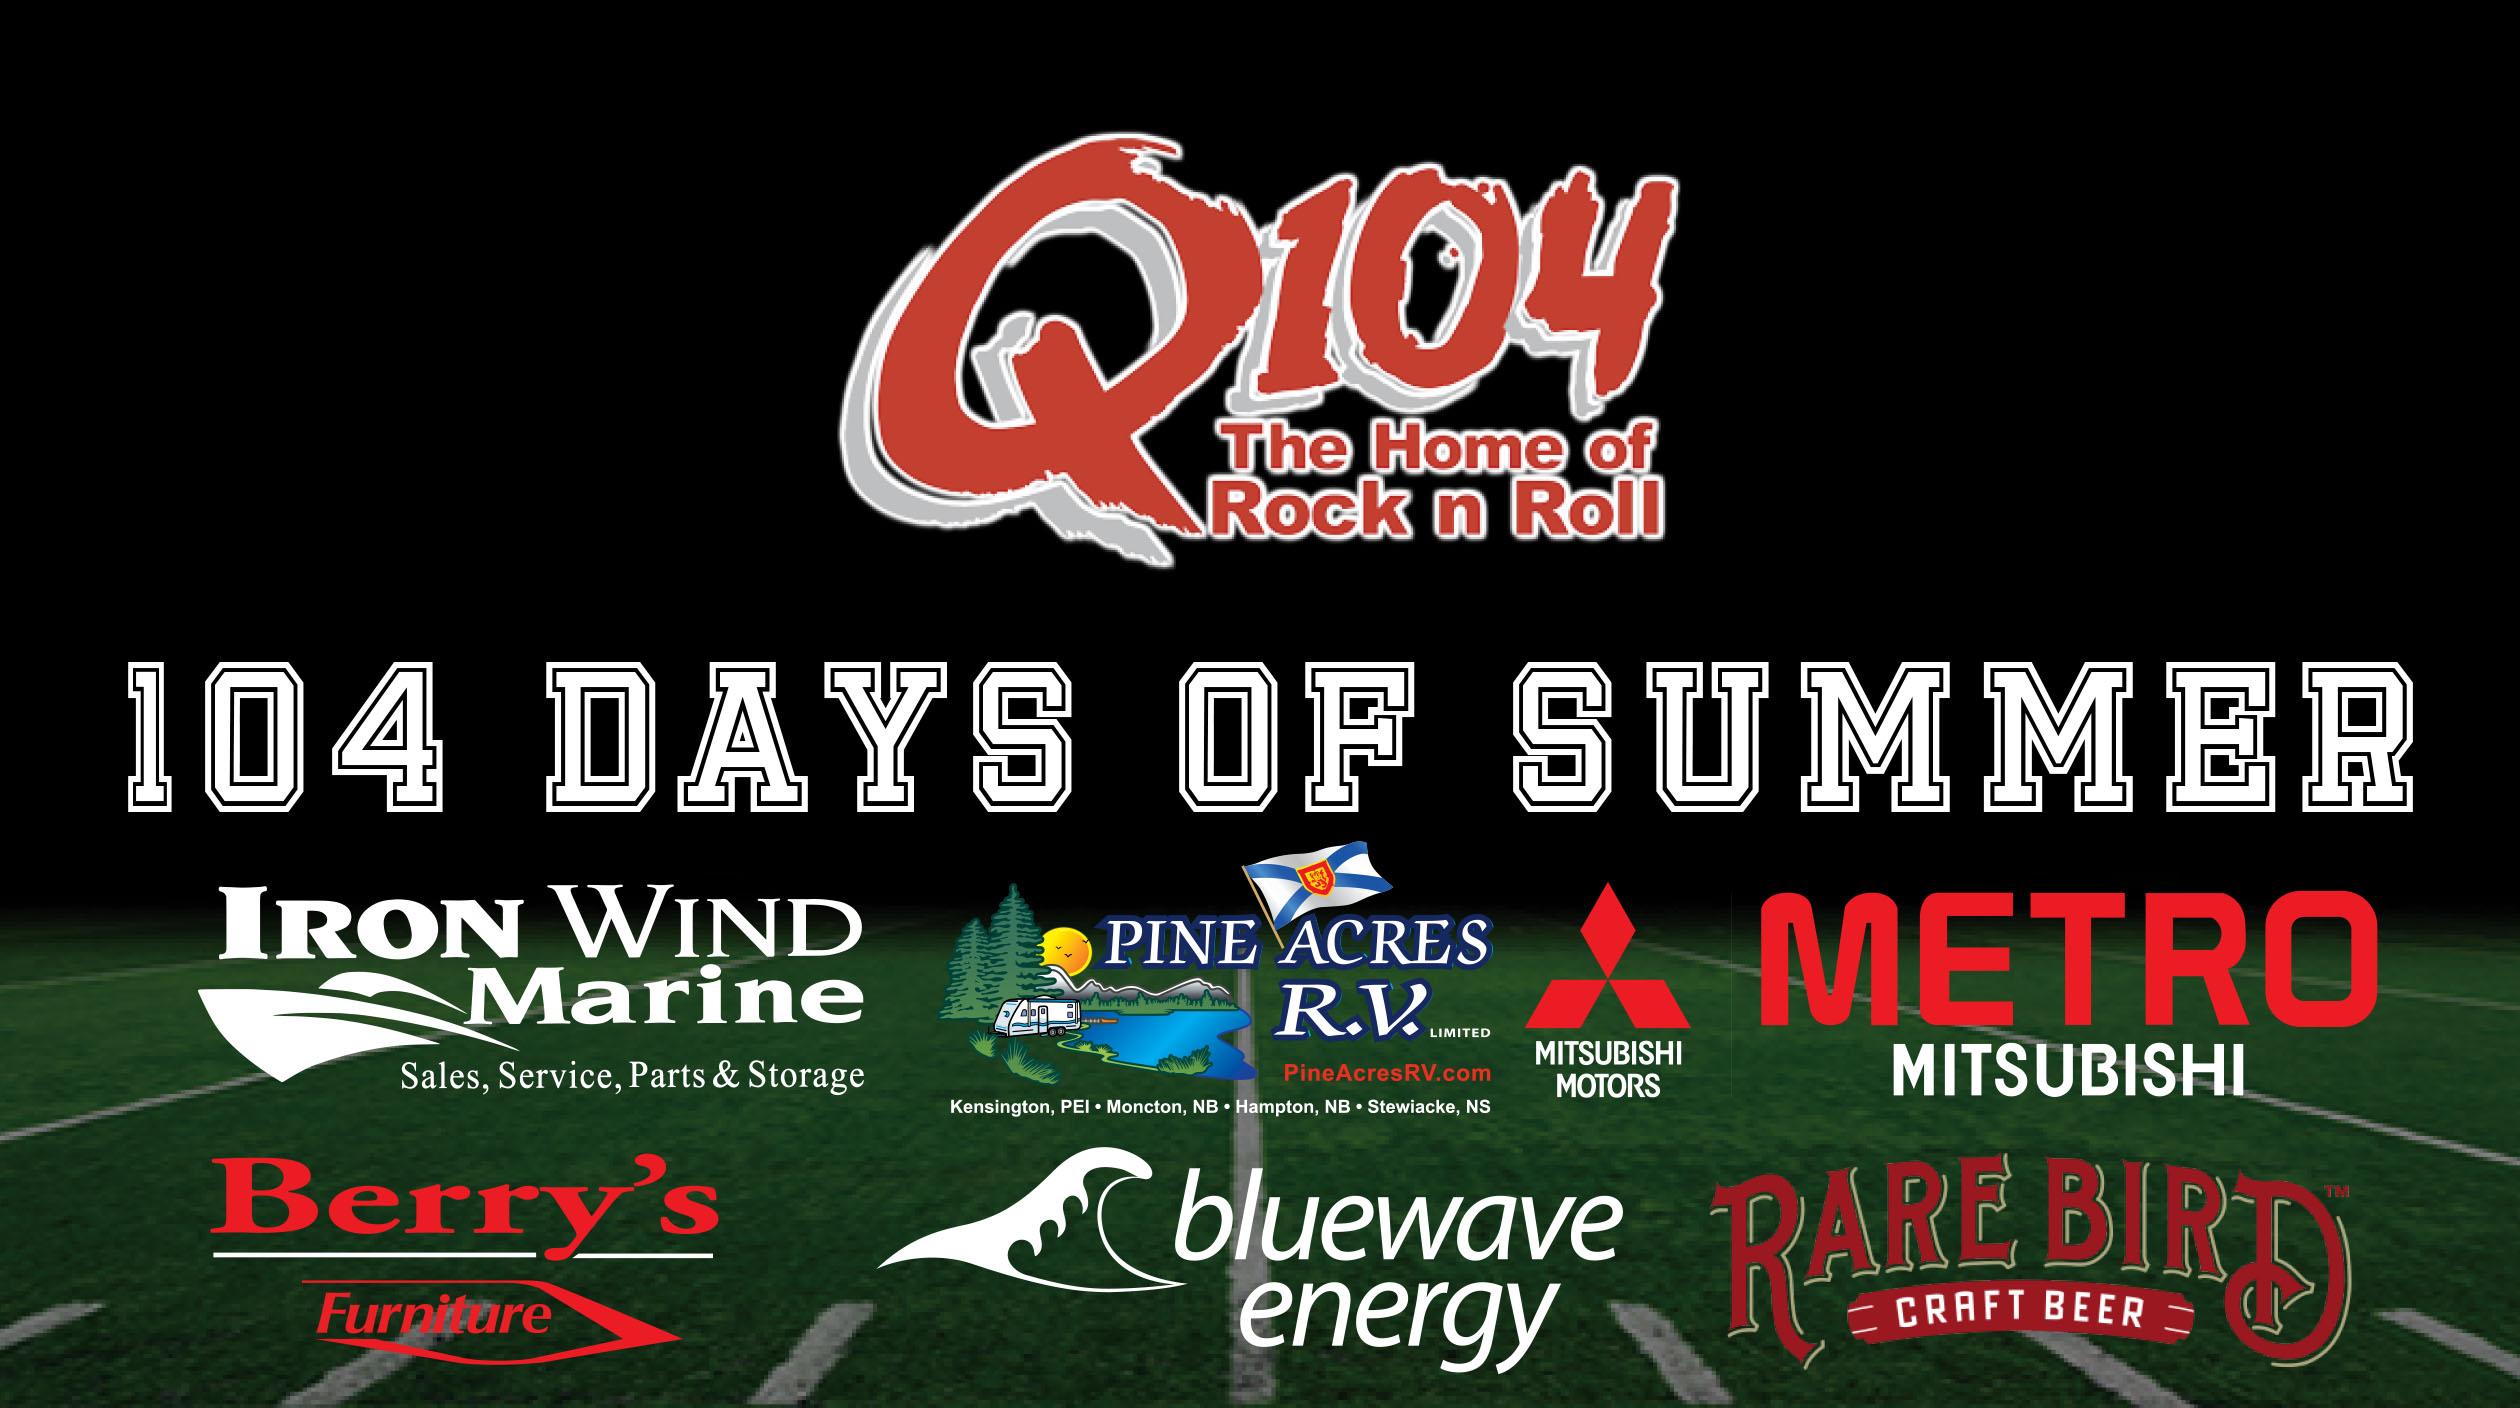 Q104's 104 Days of Summer